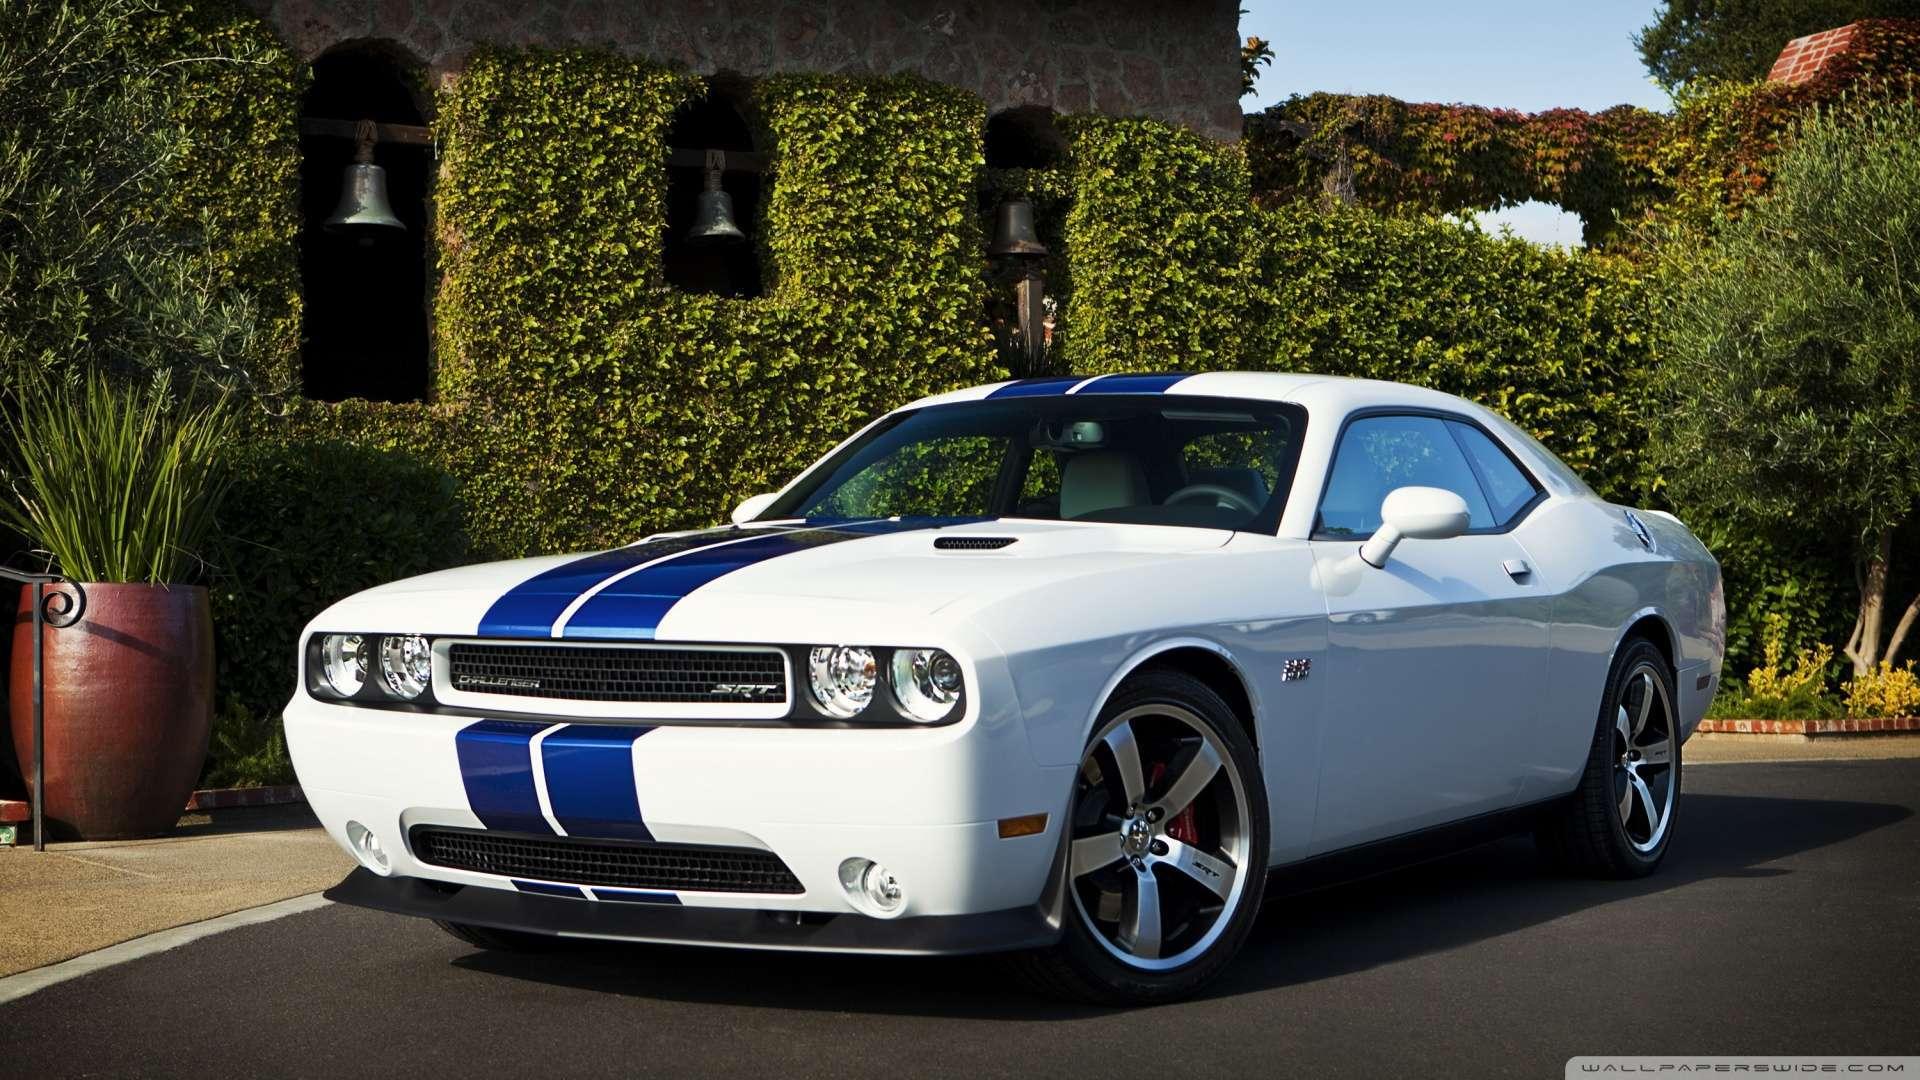 Dodge-Challenger-Srt-Blue-Stripes-1080p-HD-wallpaper-wp3404707